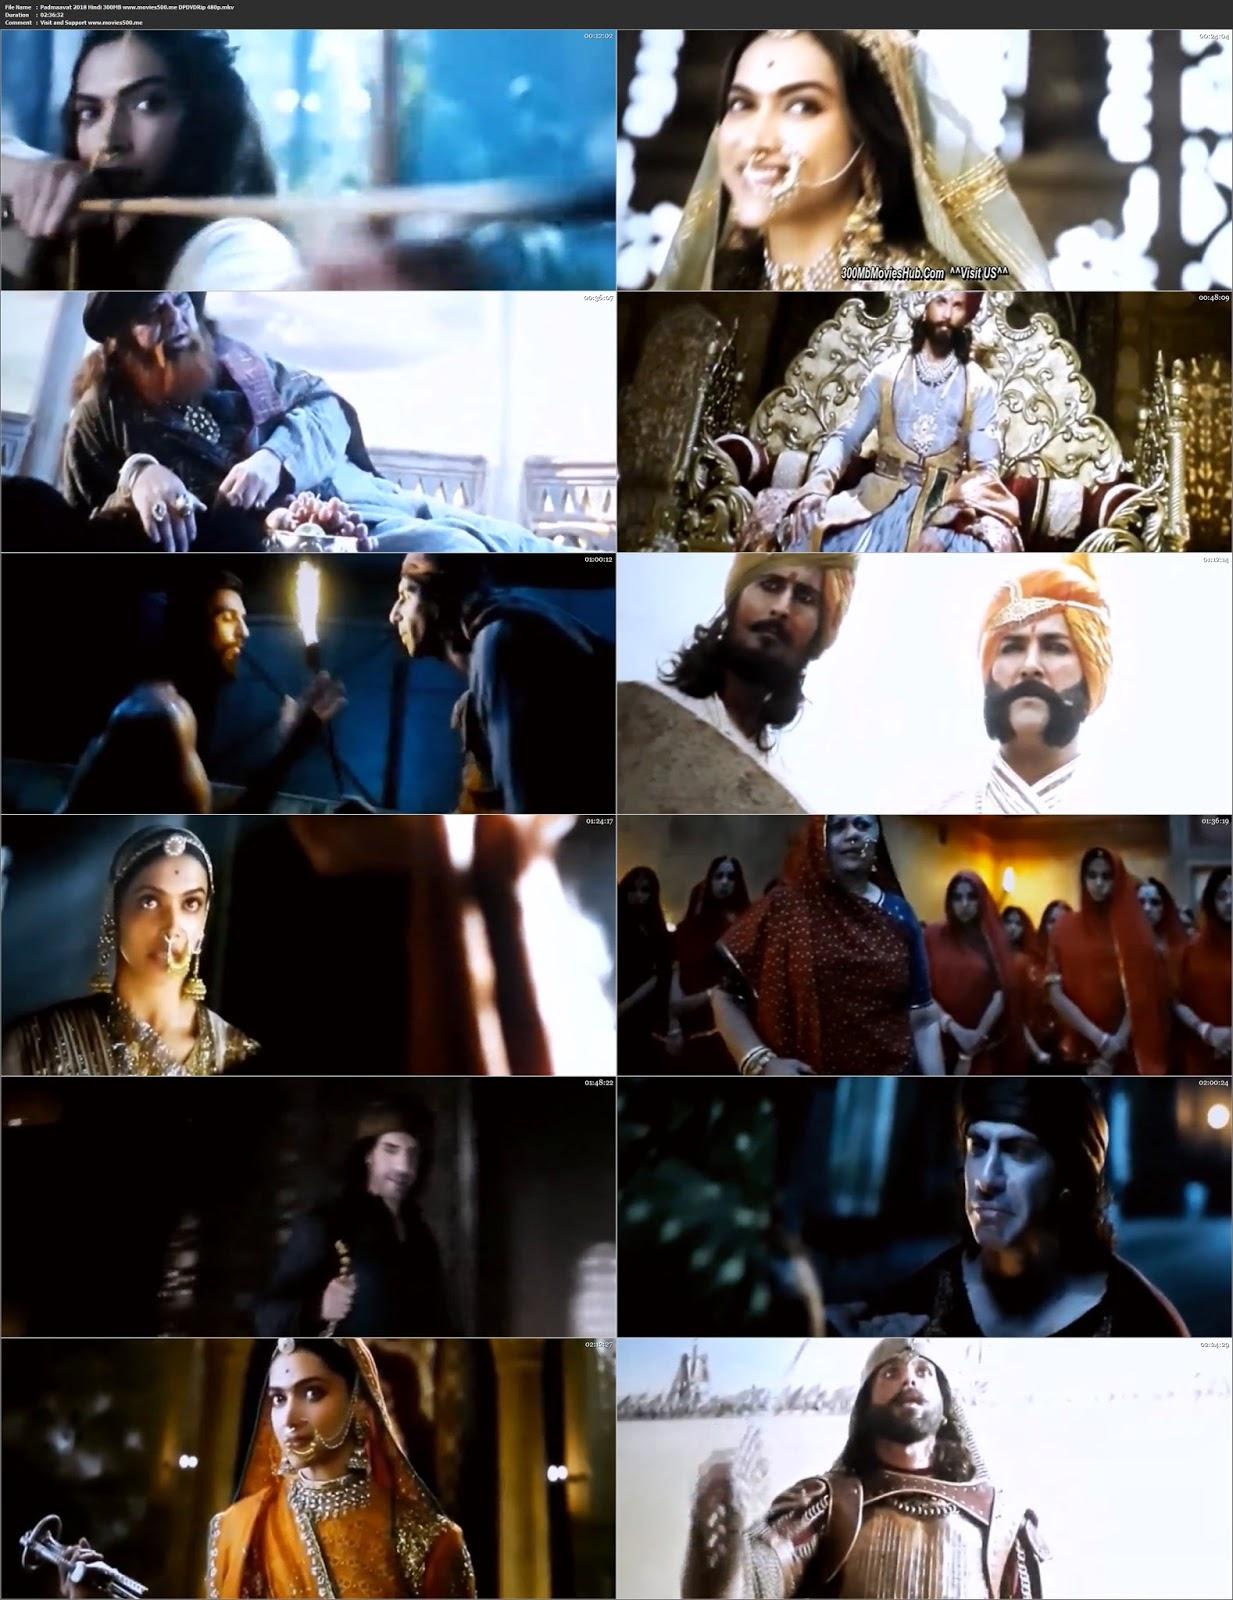 Padmaavati 2018 Bollywood 300MB Full Movie PDVDRip 480p at gileadhomecare.com